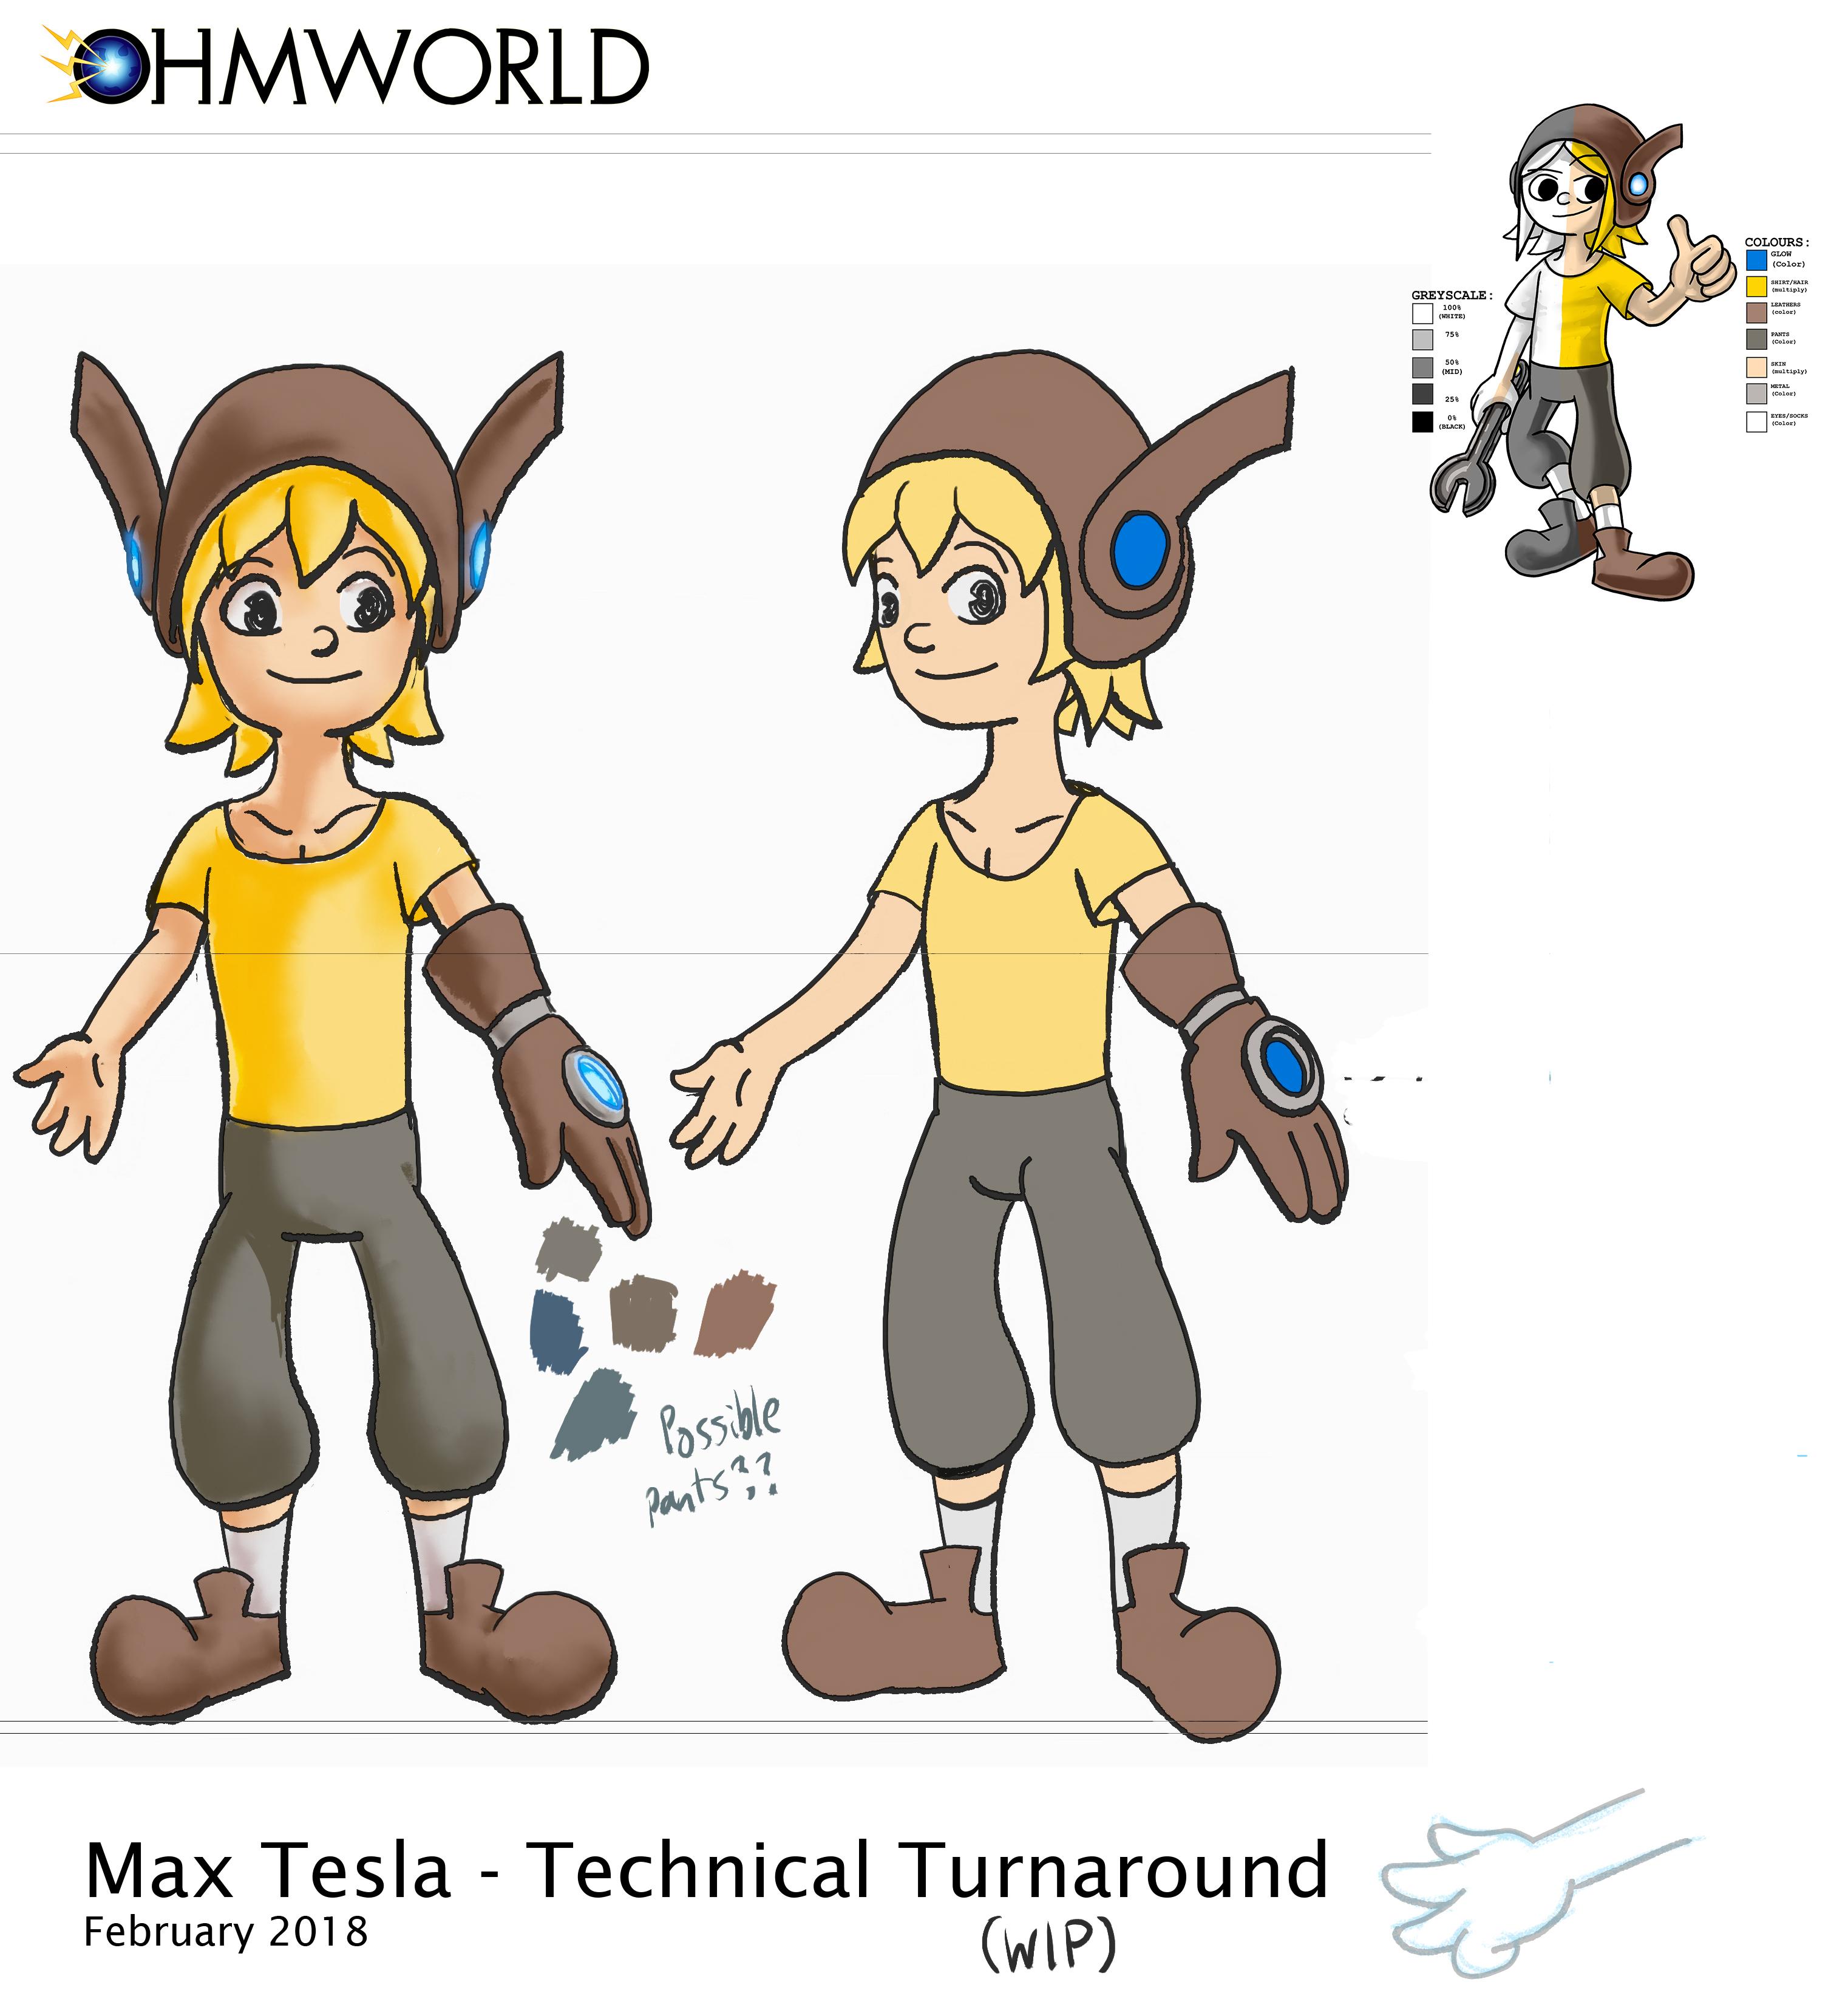 2018-02Feb Max Tesla Turnaround (2 points col test)